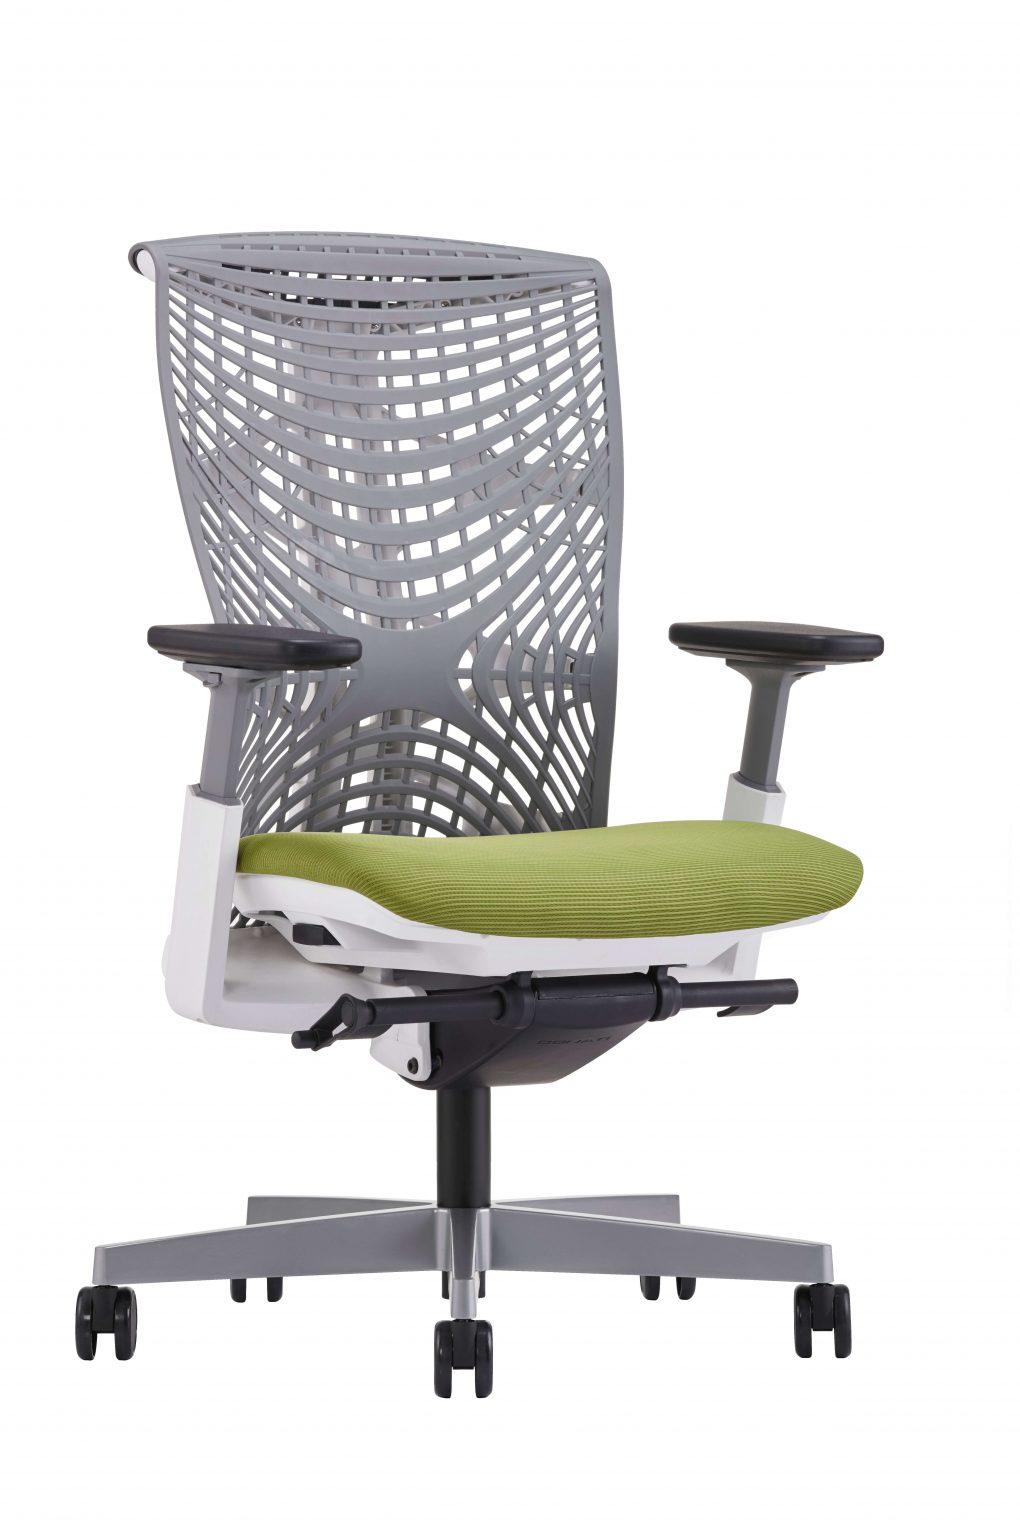 Merryfair Reya Lime Grey Ergo Chair scaled